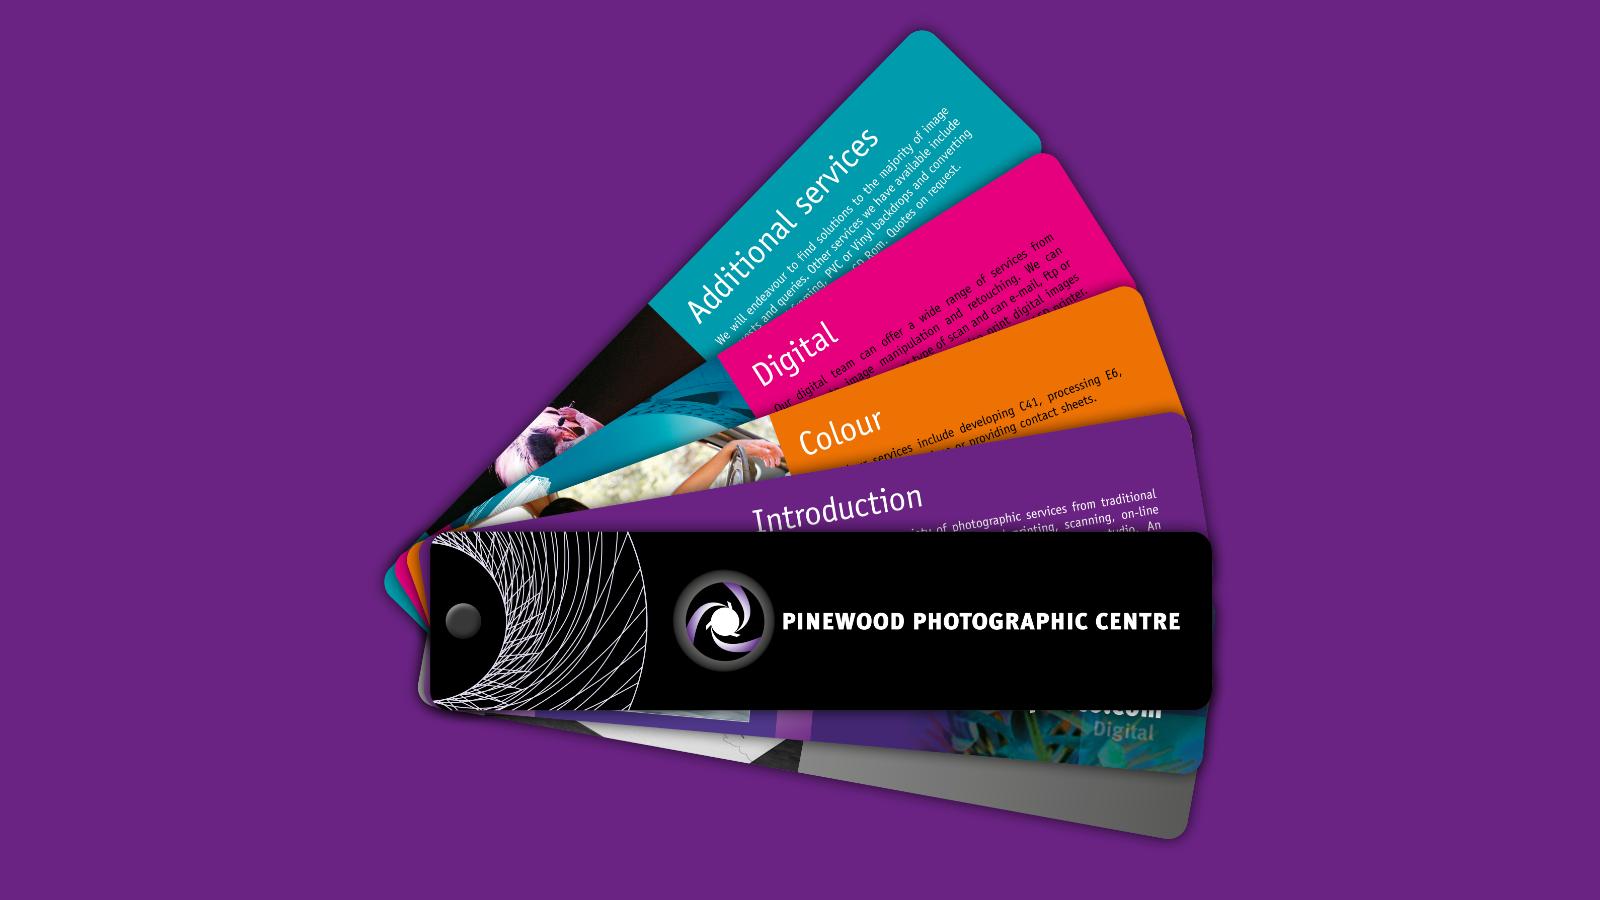 Pinewood Photographic Centre marketing swatch